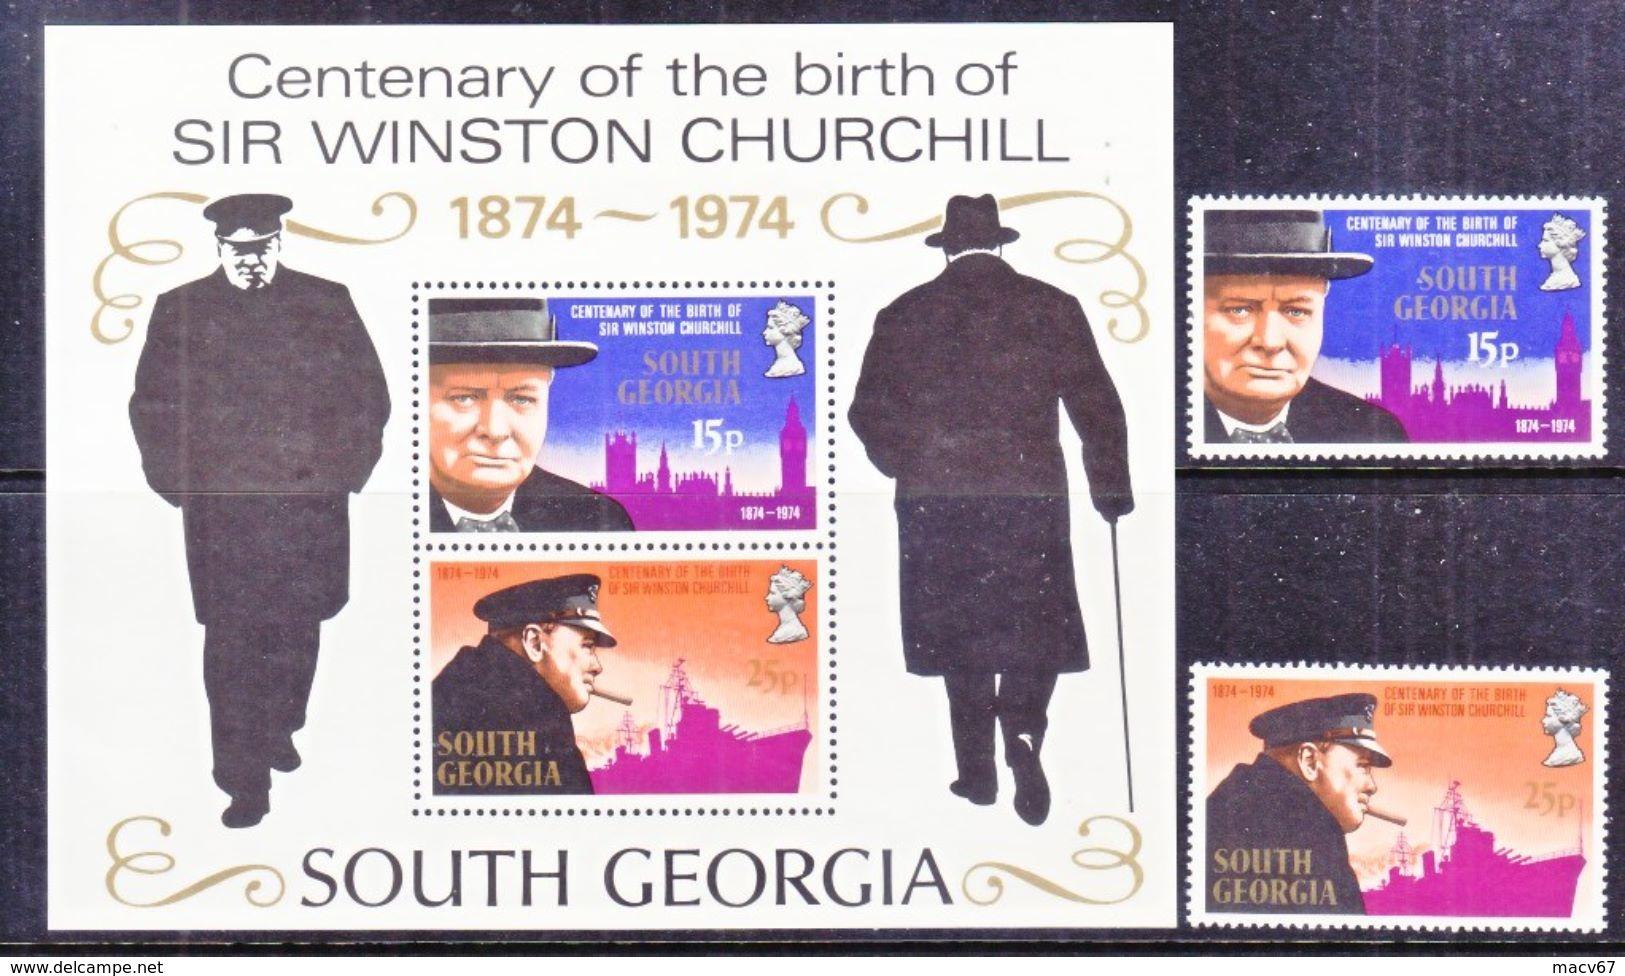 SOUTH  GEORGIA  39-40a  **   SIR  WINSTON  CHURCHILL - Sir Winston Churchill